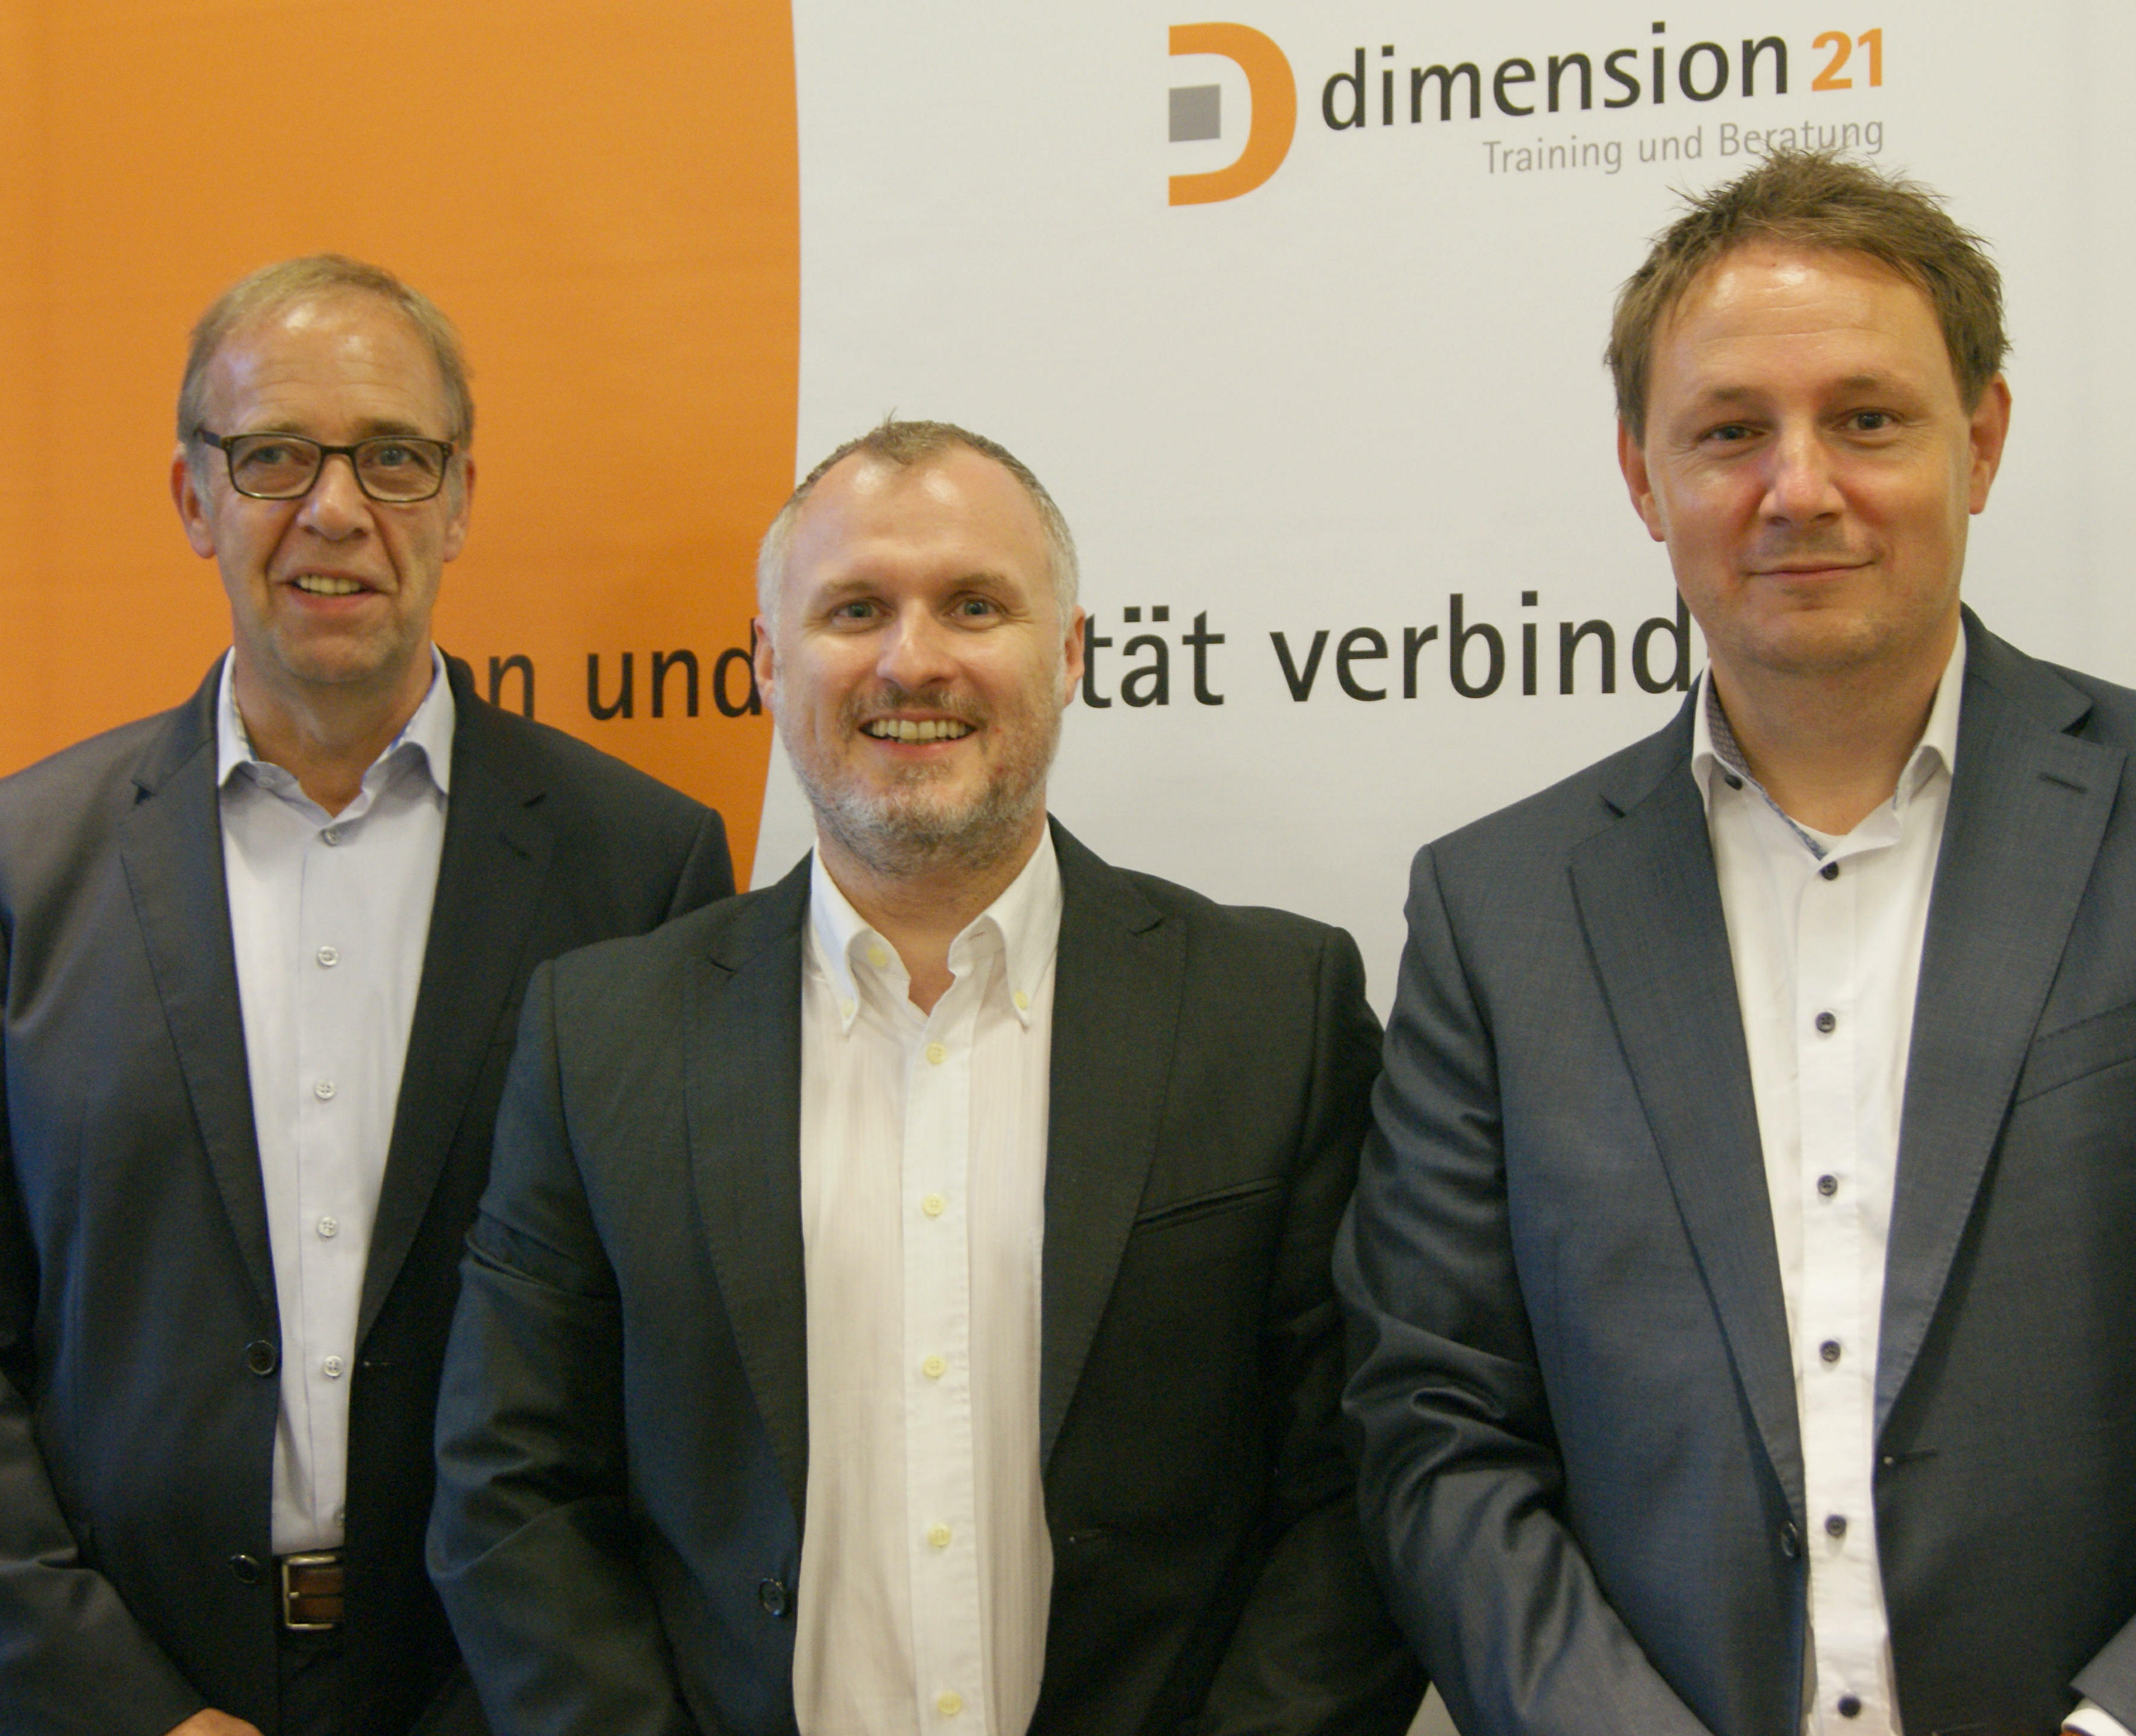 Geschäftsführende Gesellschafter ab dem 01.01.2018: (v. l.:) Helge Werner, Kai Romes und Dr. Christian Kuhlmann (Foto: dimension21)